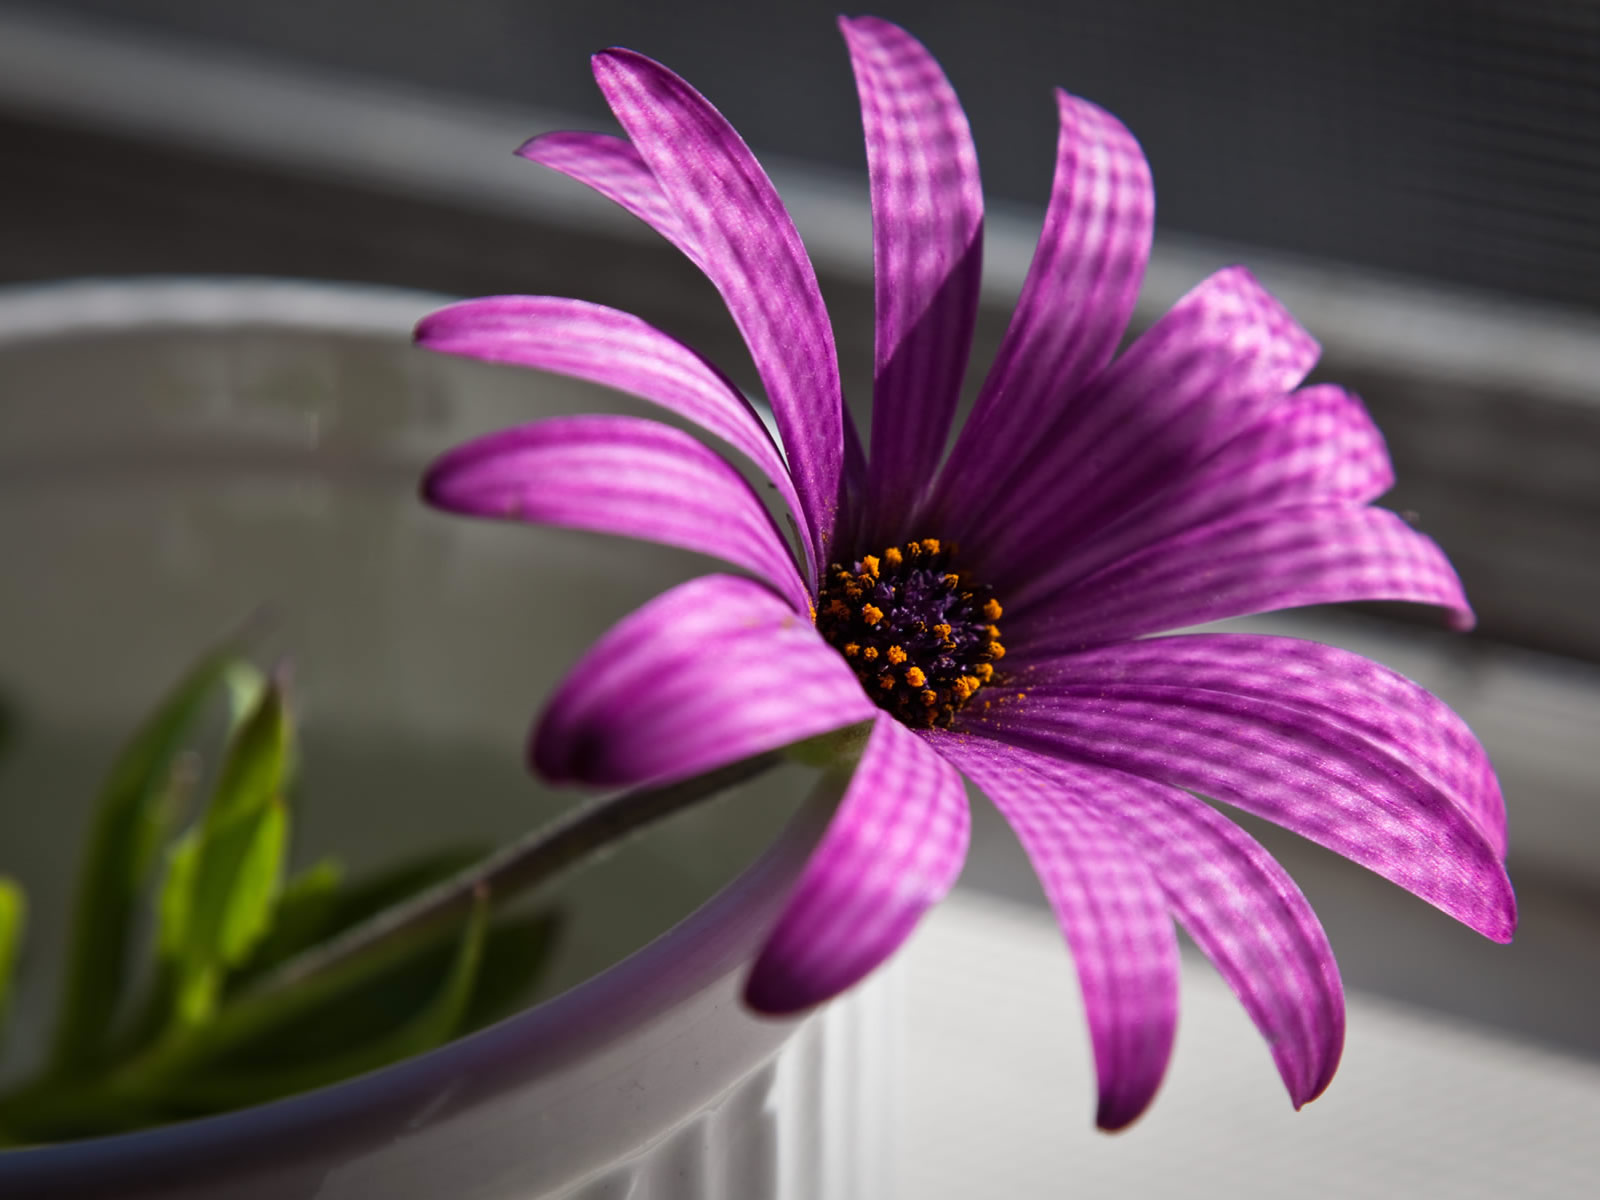 flowers for flower lovers.: Desk top HD Beautiful flowers wallpapers.